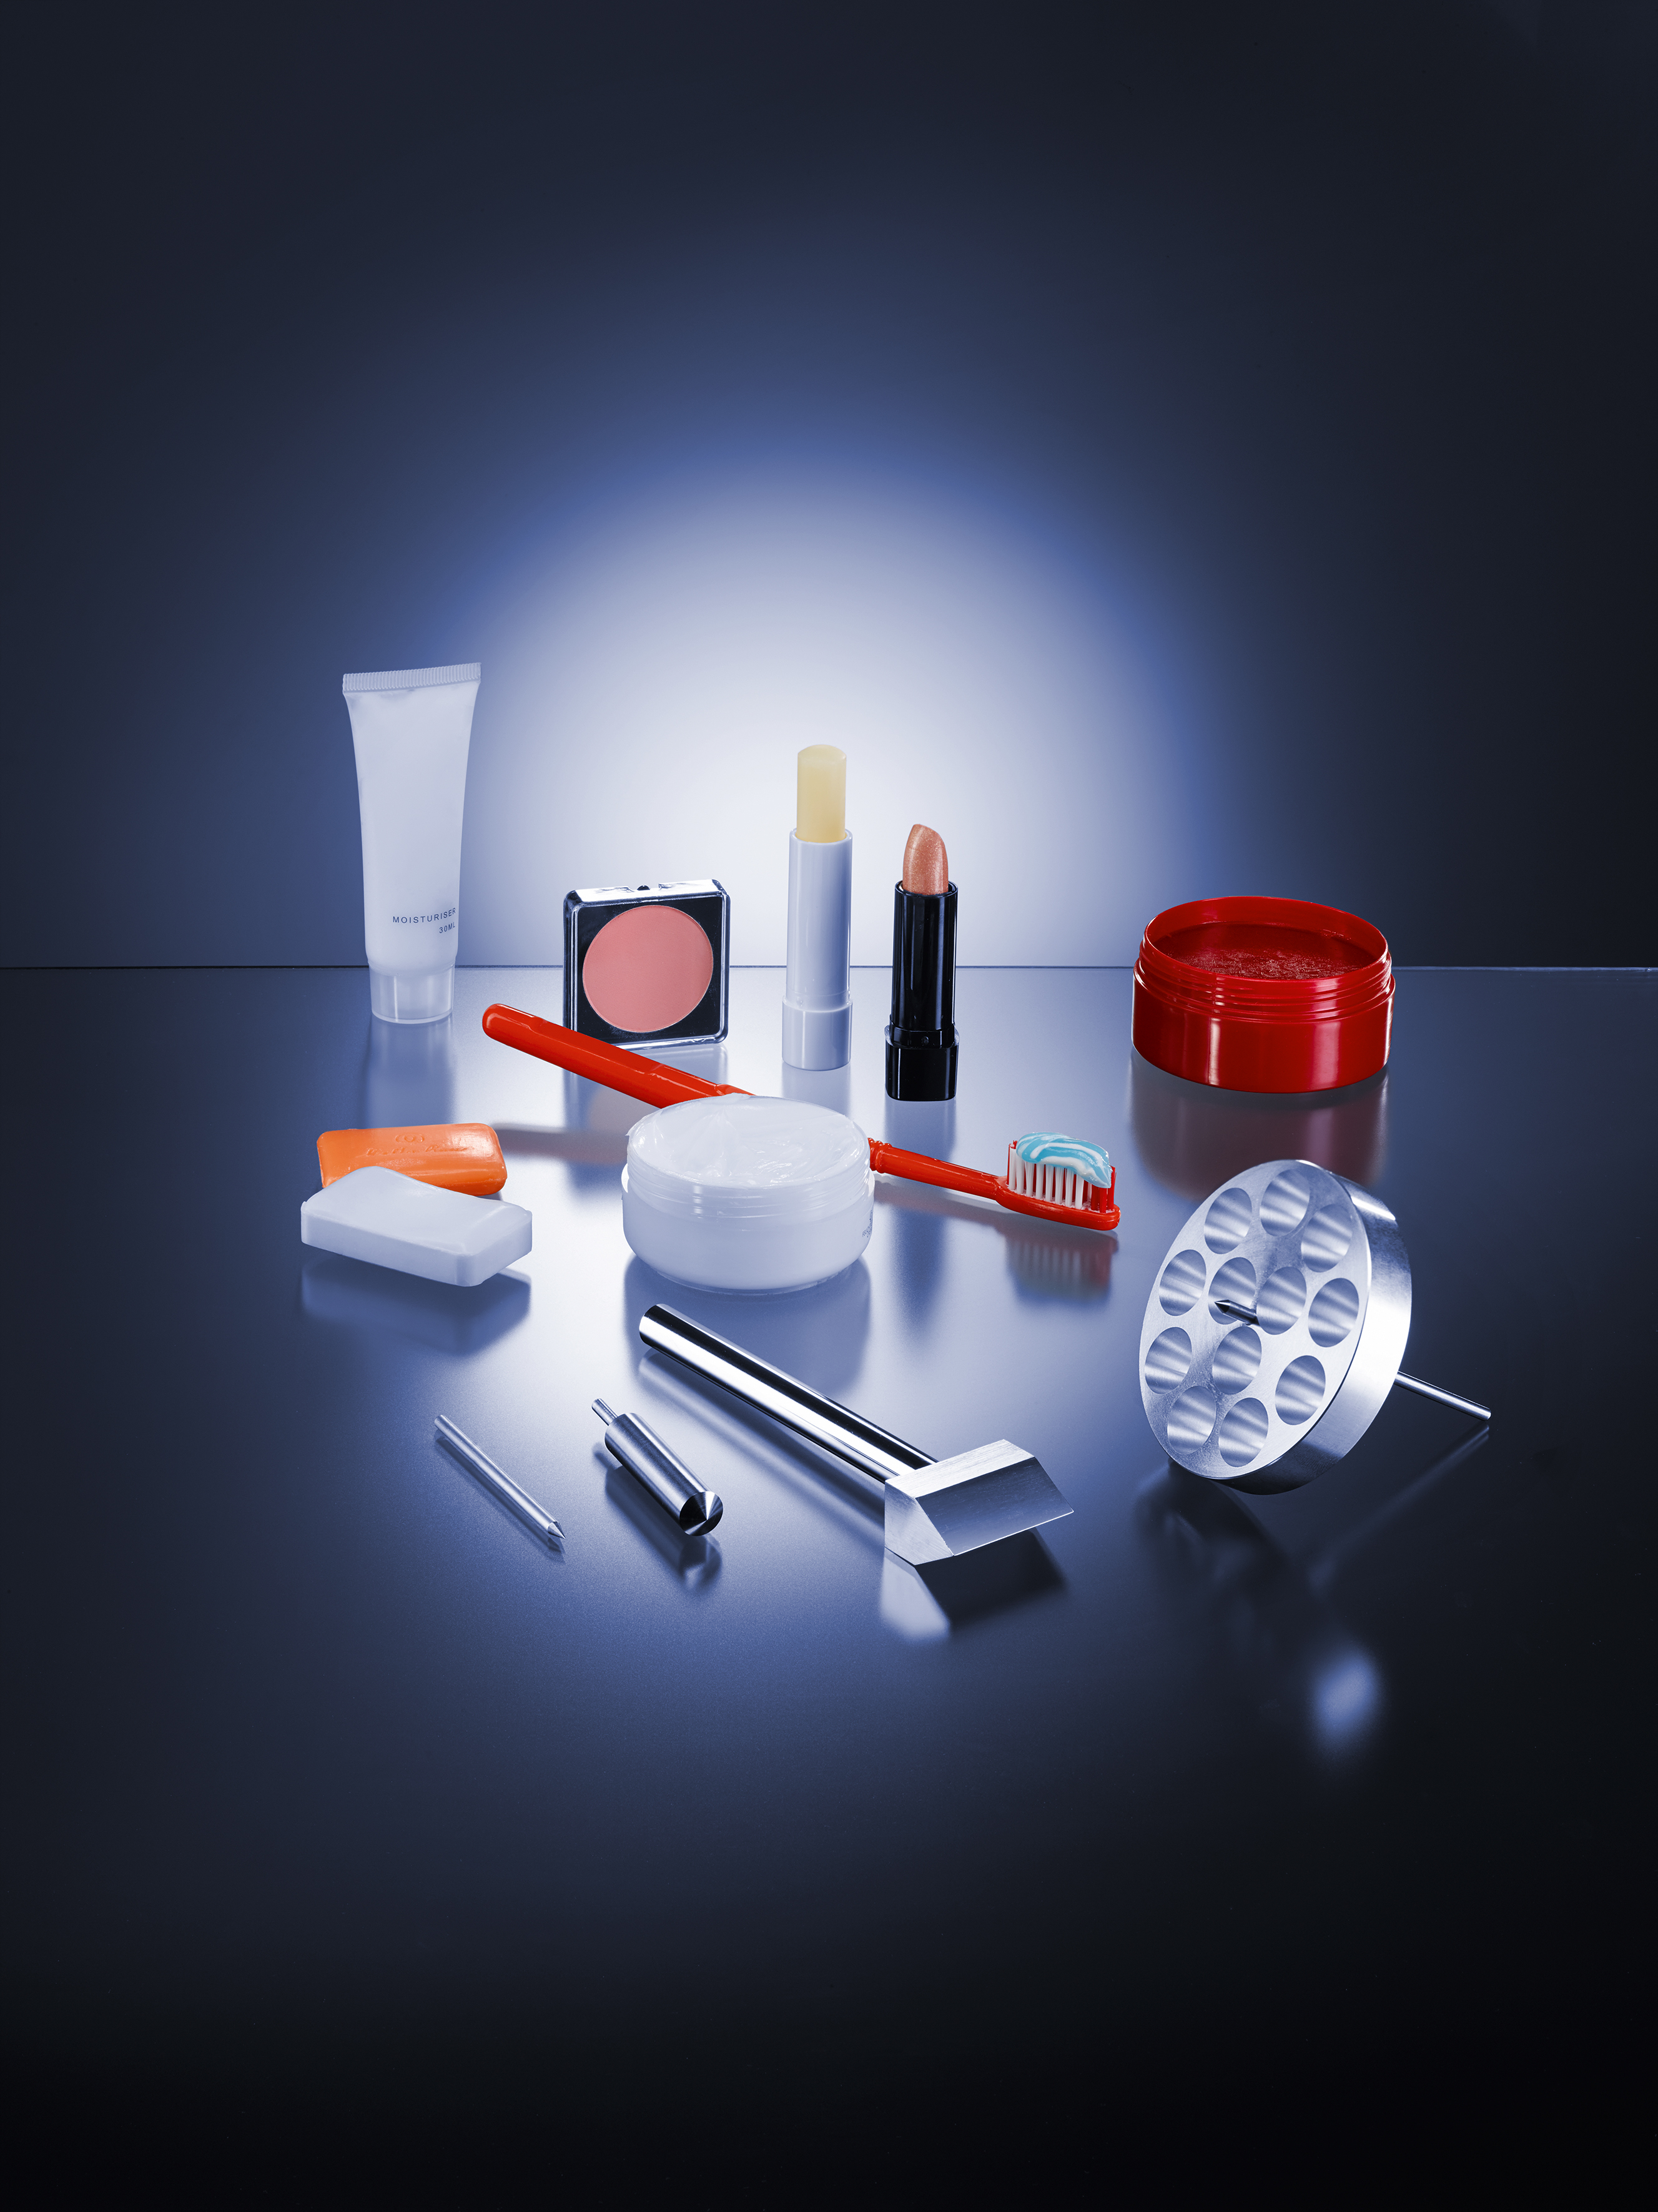 Consistency of cosmetics